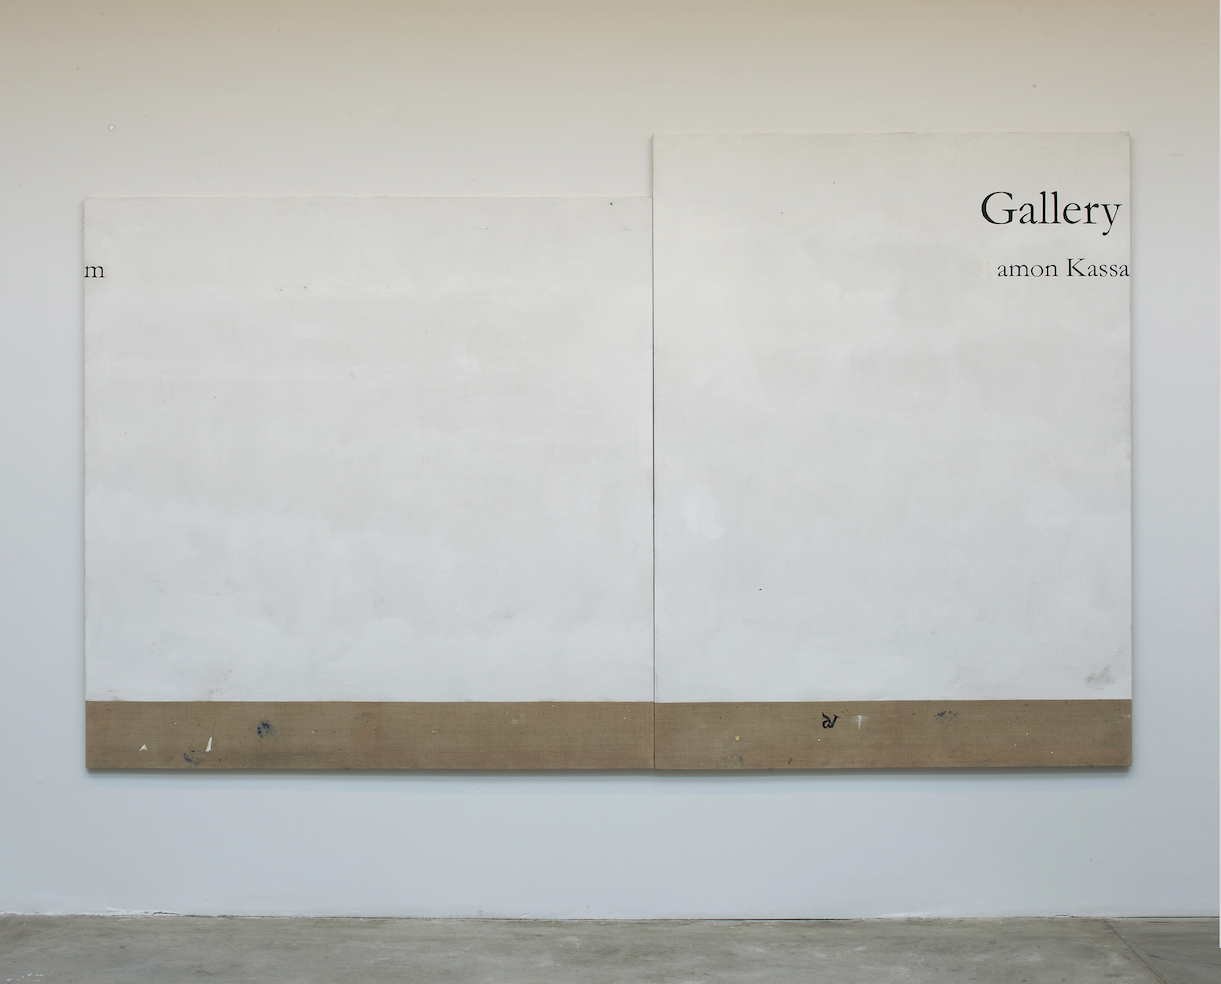 Gallery.  Acrylic & plastic on linen, 330x200cm, 2015.